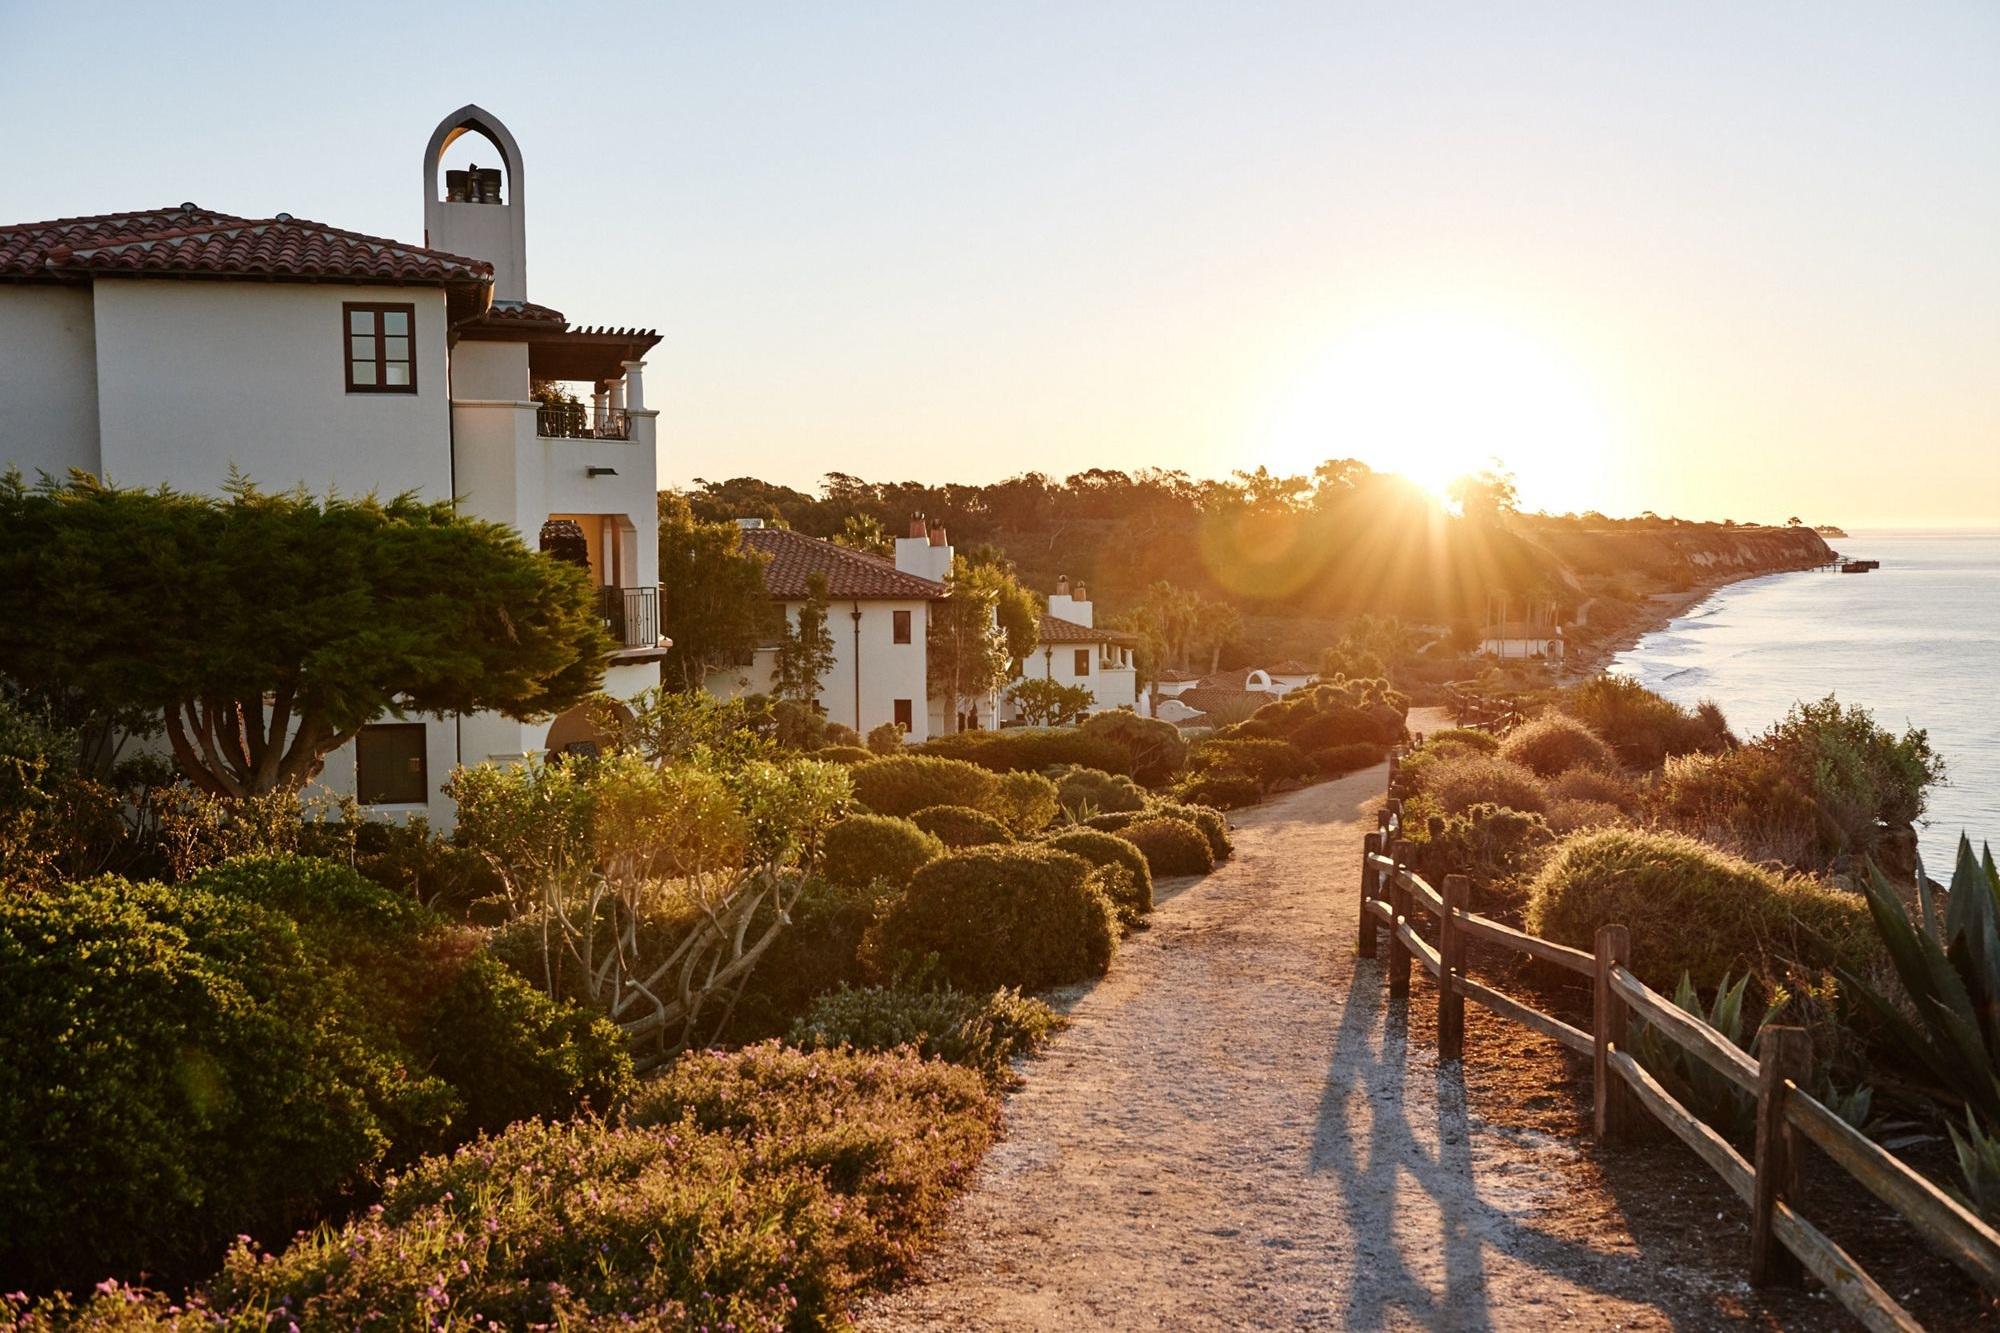 Photo: The Ritz-Carlton Bacara, Santa Barbara - Santa Barbara, California